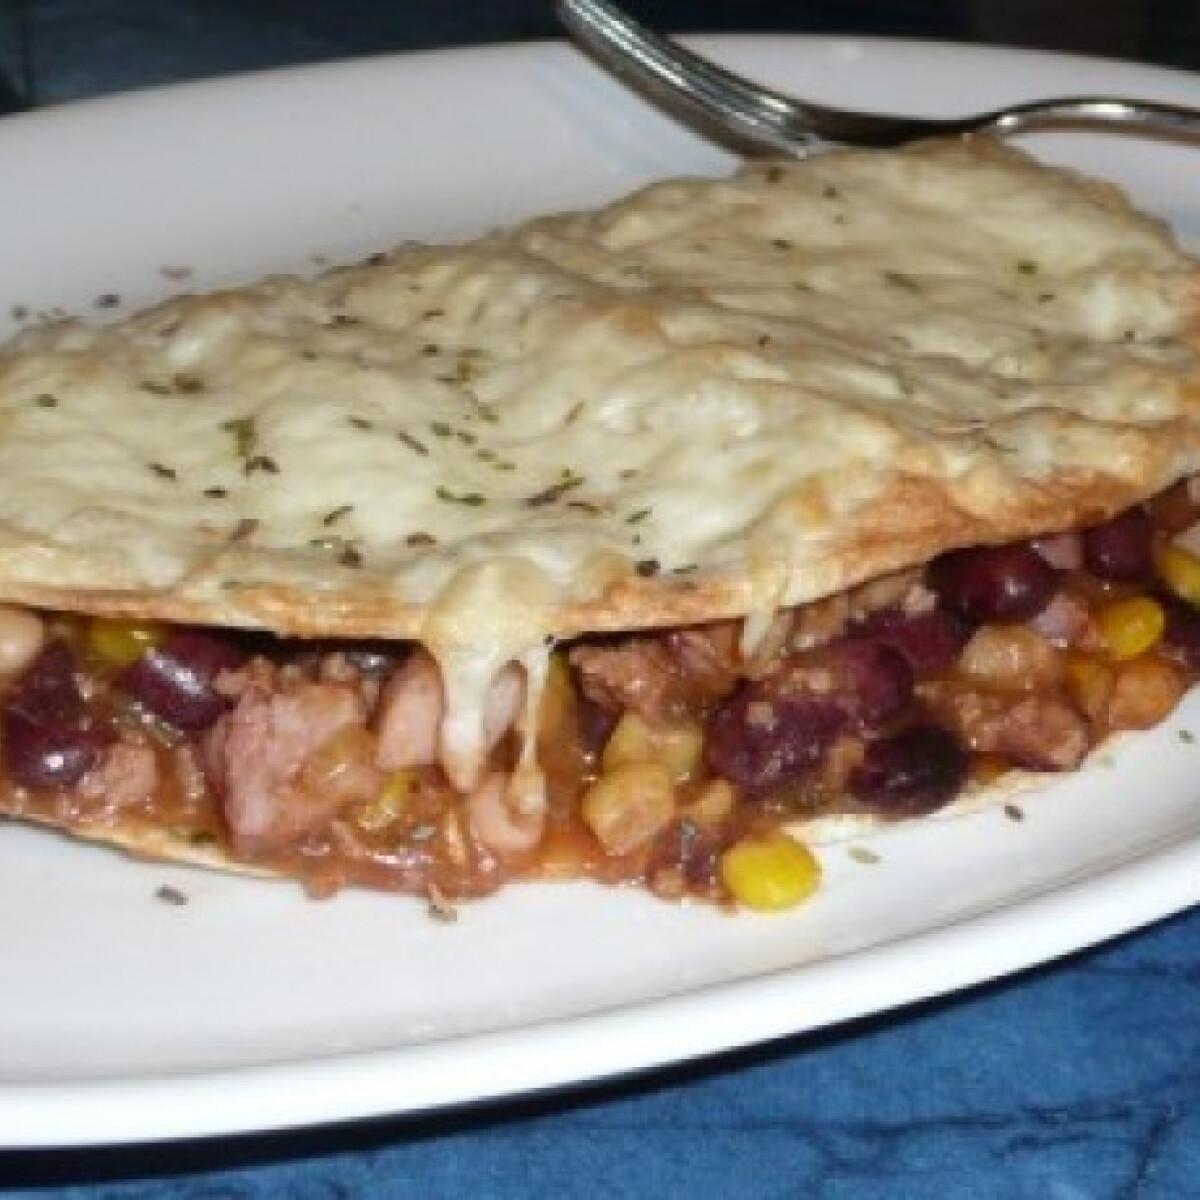 Ezen a képen: Chili con carne tortillában